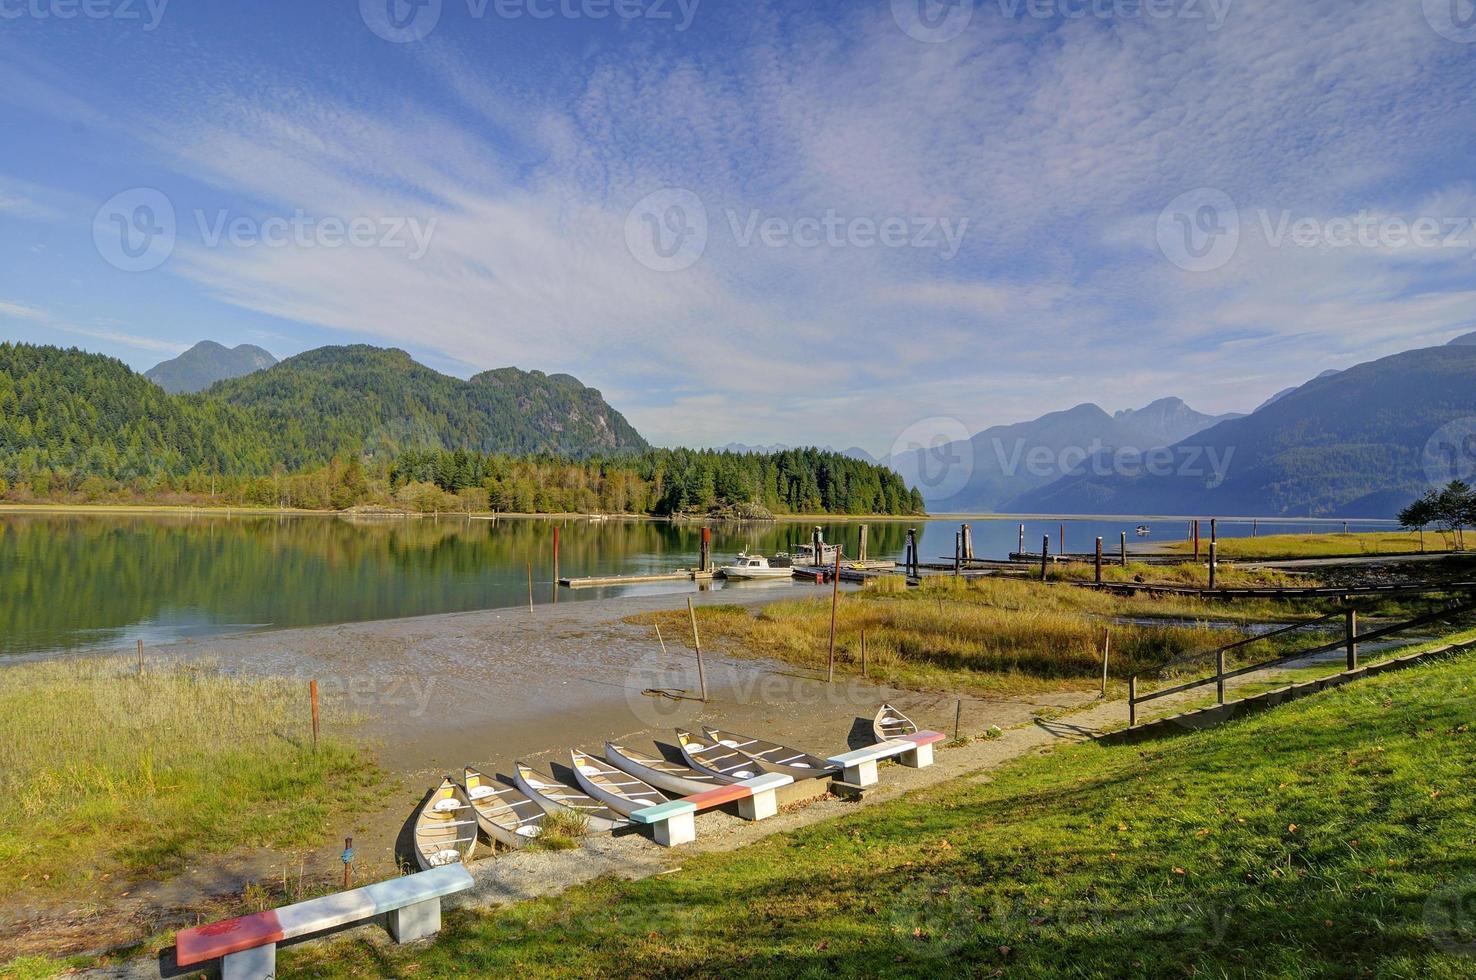 Pitt Lake photo